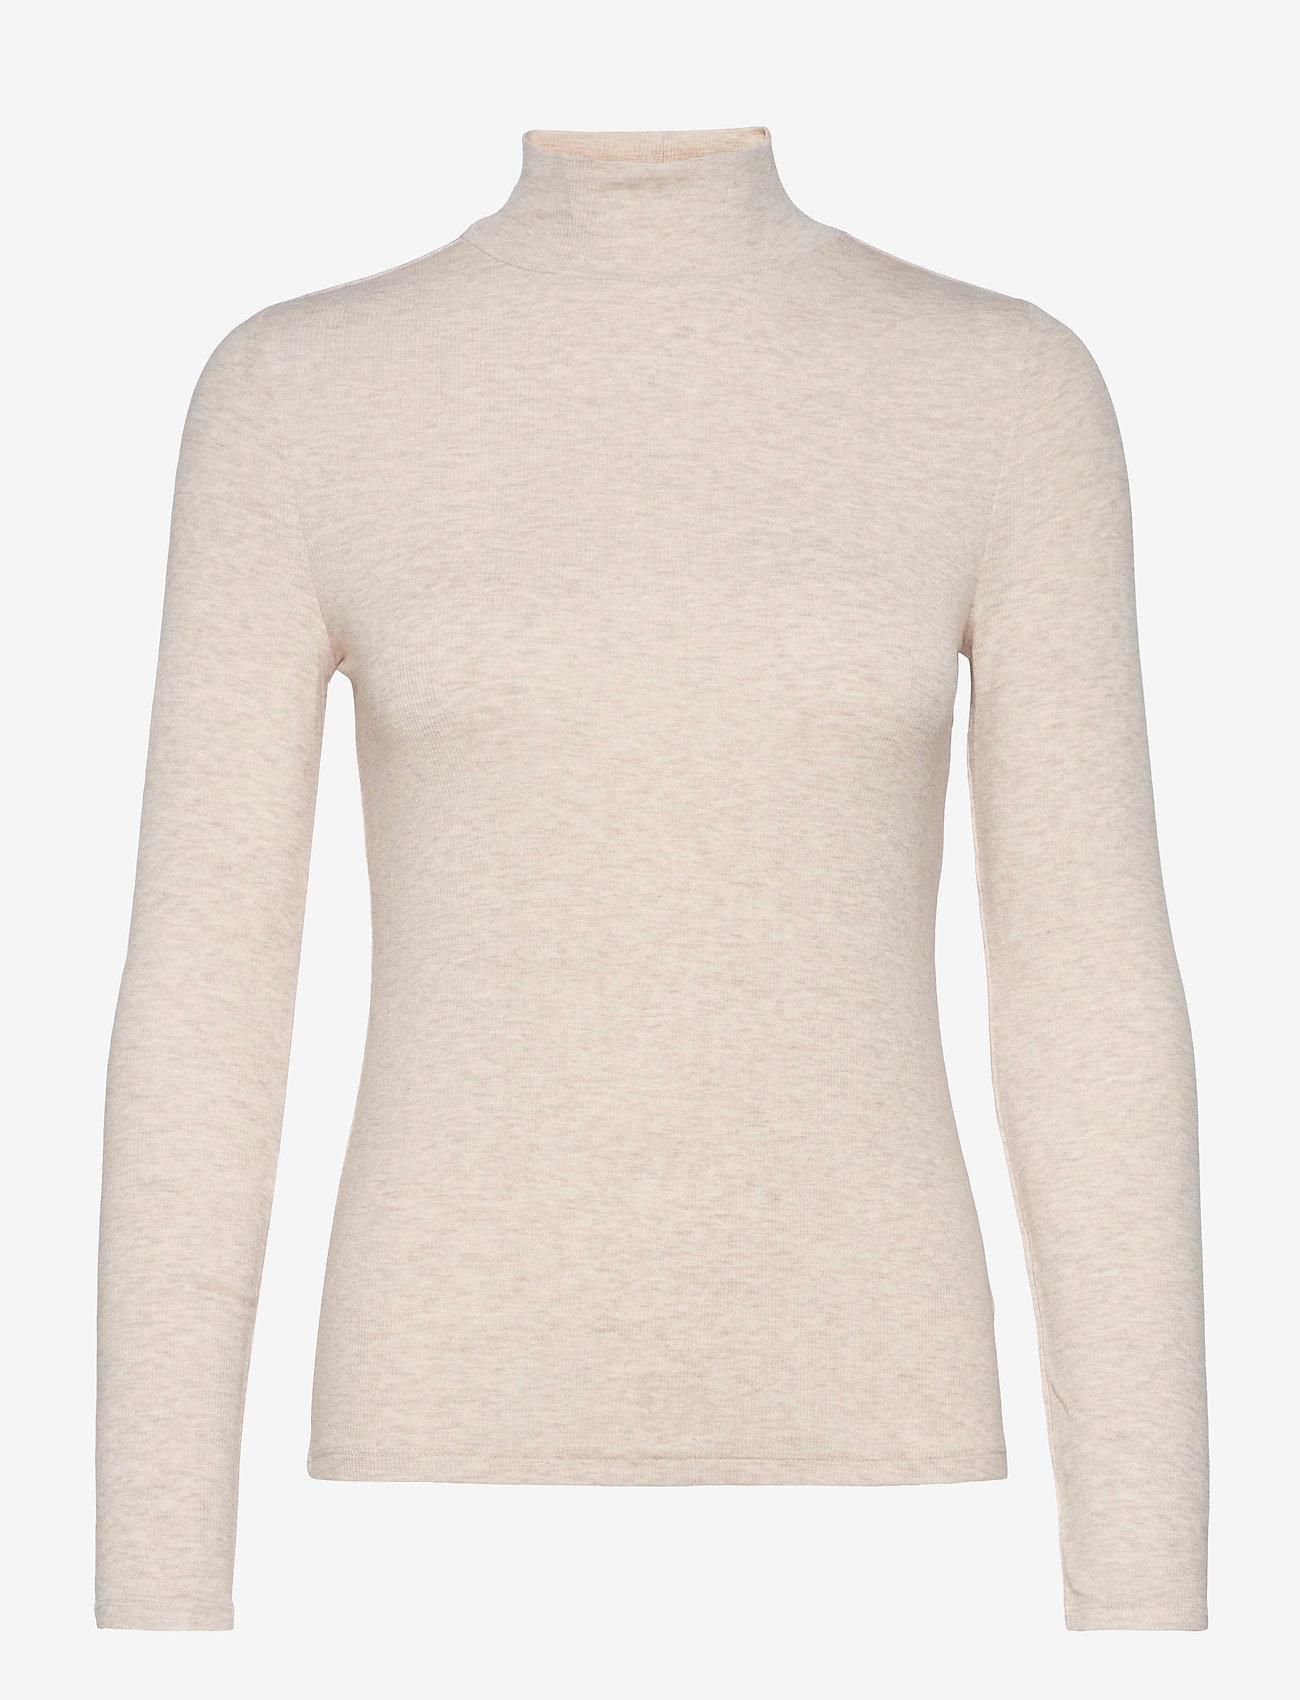 GAP - LS COZY RIB TNK - turtlenecks - oatmeal heather b0294 - 0